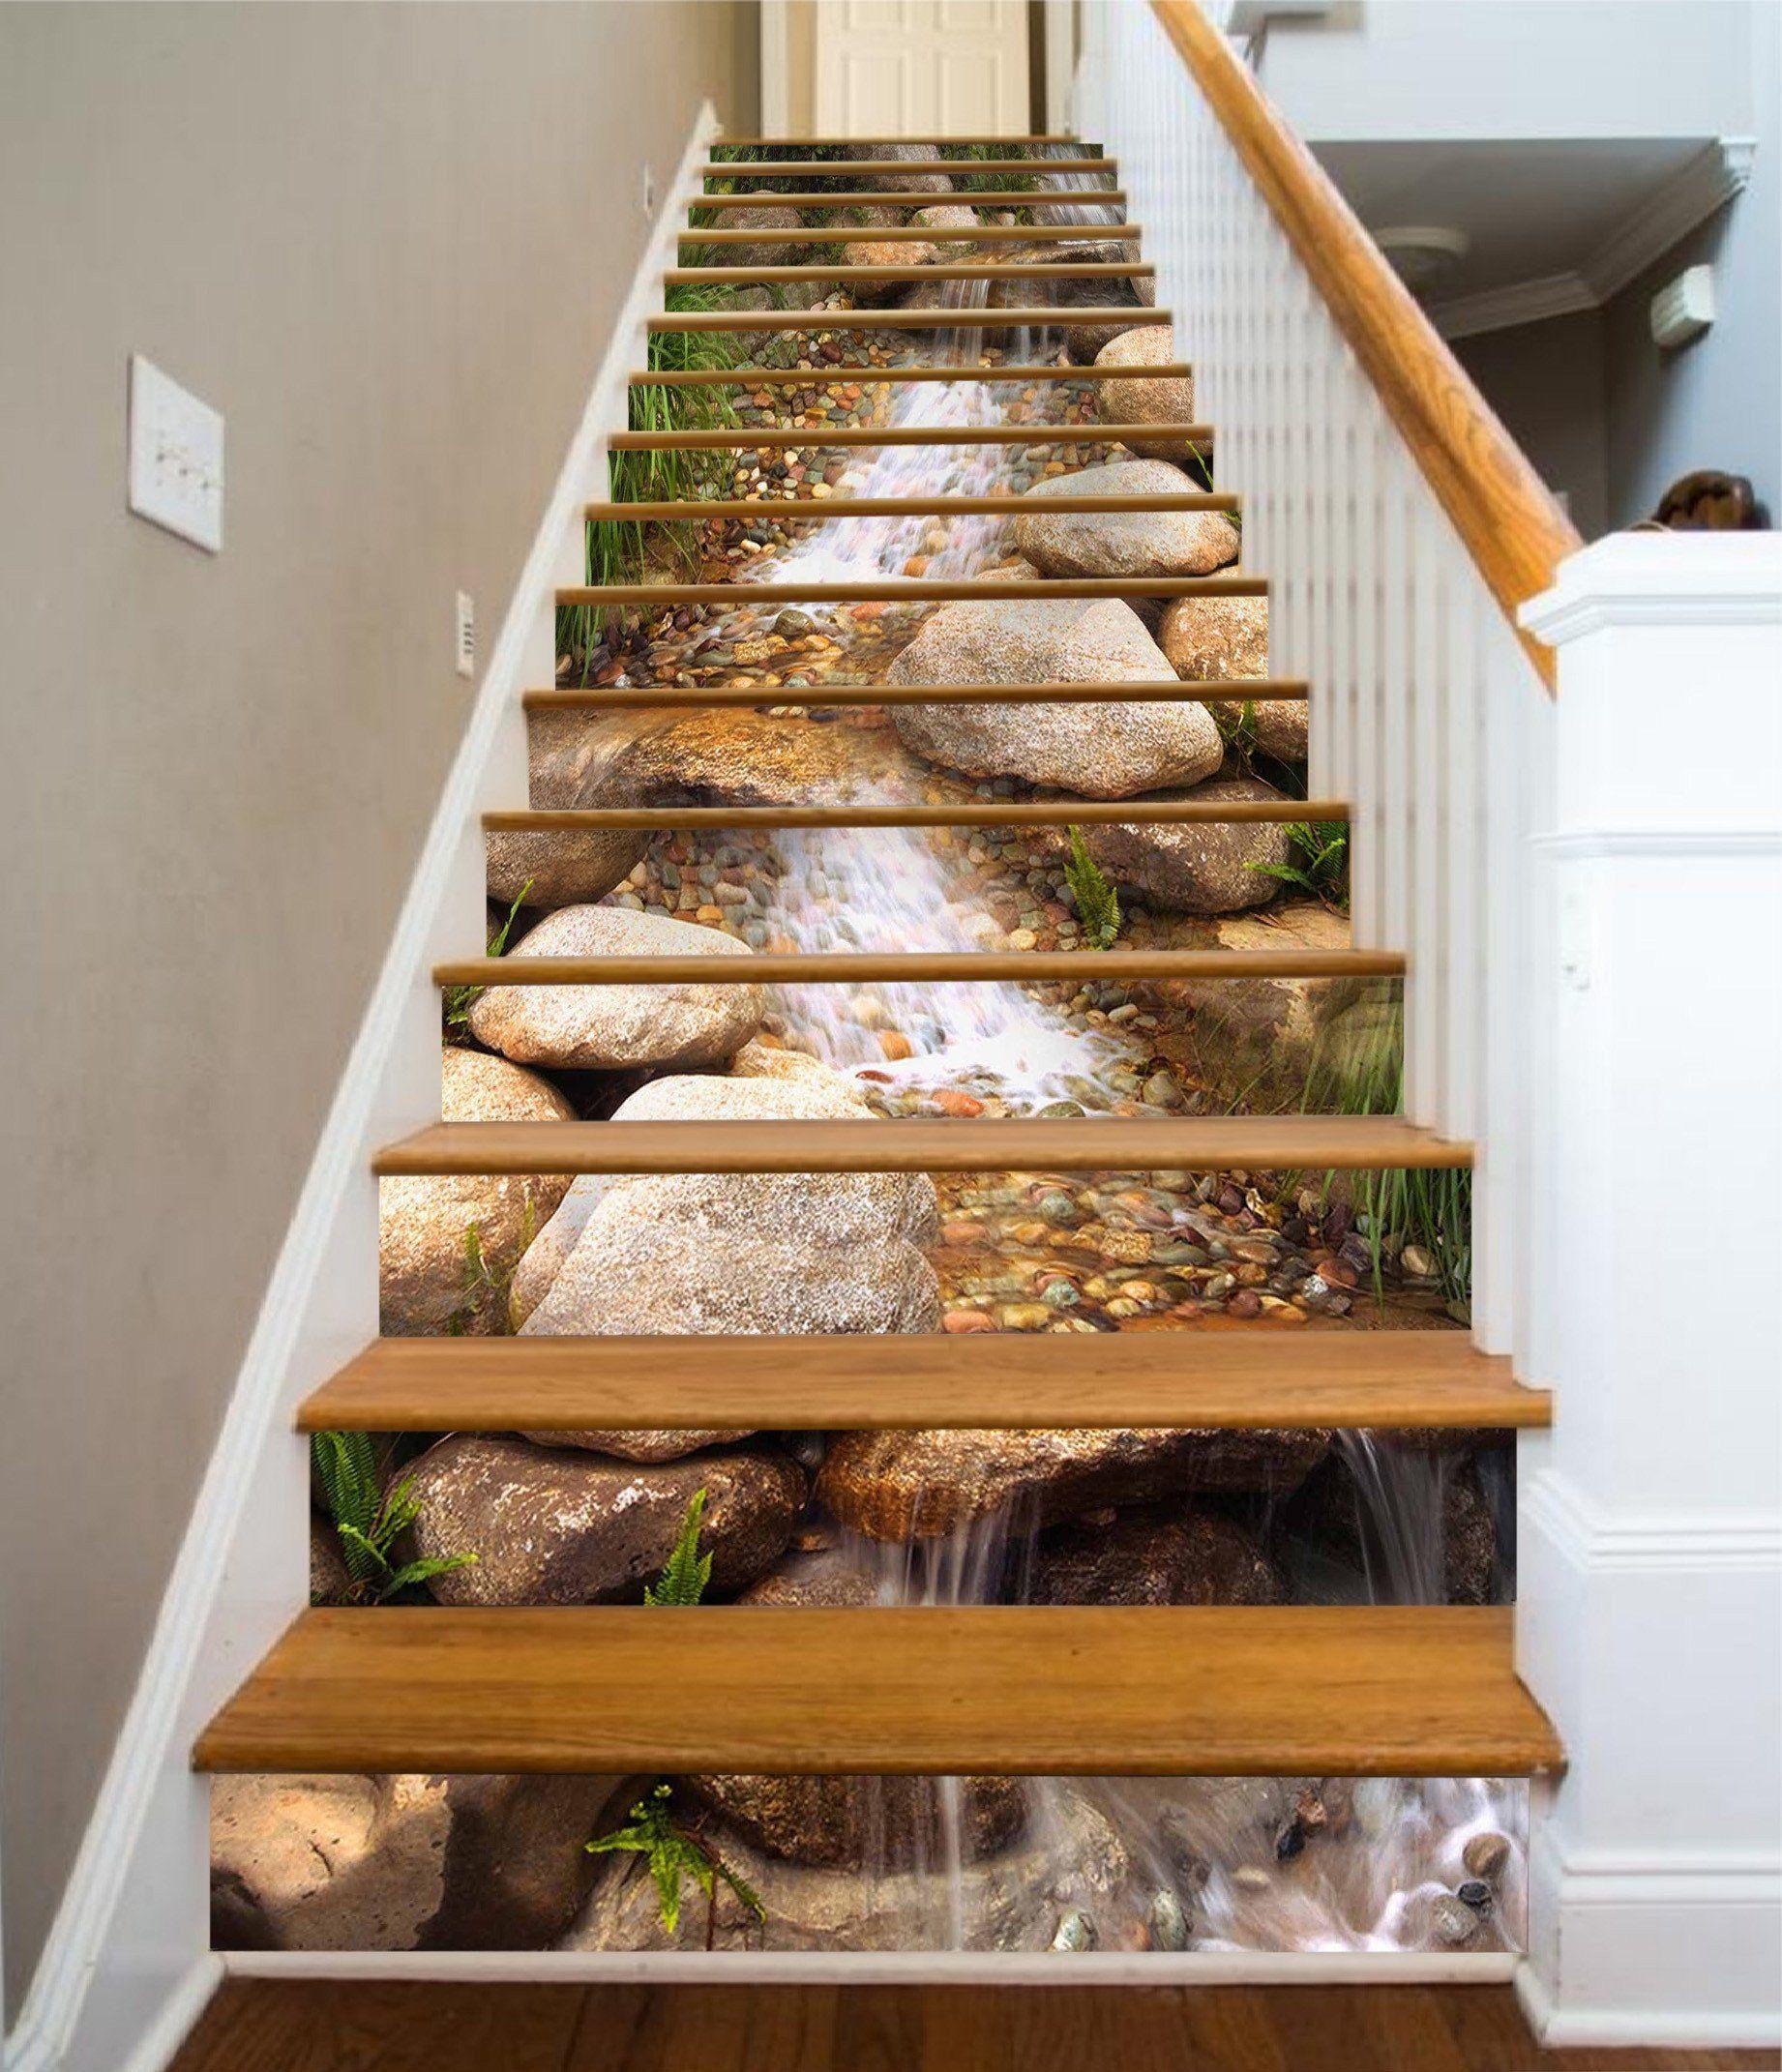 Best 3D Creek Stones 1627 Stair Risers Rustic Stairs 400 x 300